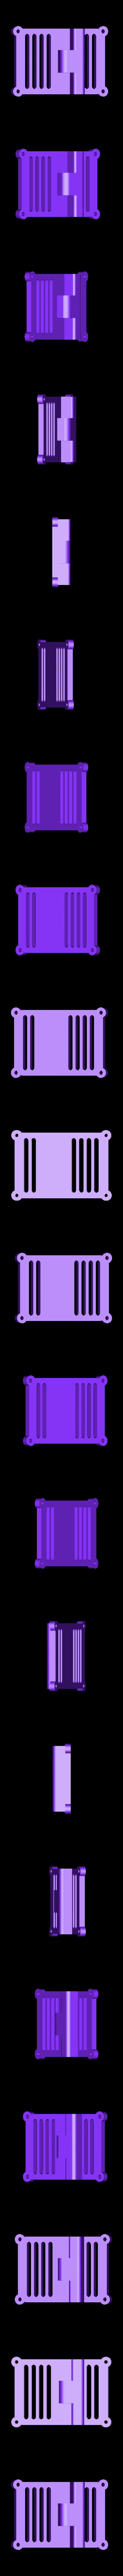 quad 90 tiny whoop TPU Top plate camera Tx01- Tx02- Tx03.stl Download free STL file Indestructible Tiny Whoop TPU 90mm 2S • 3D printable model, Microdure